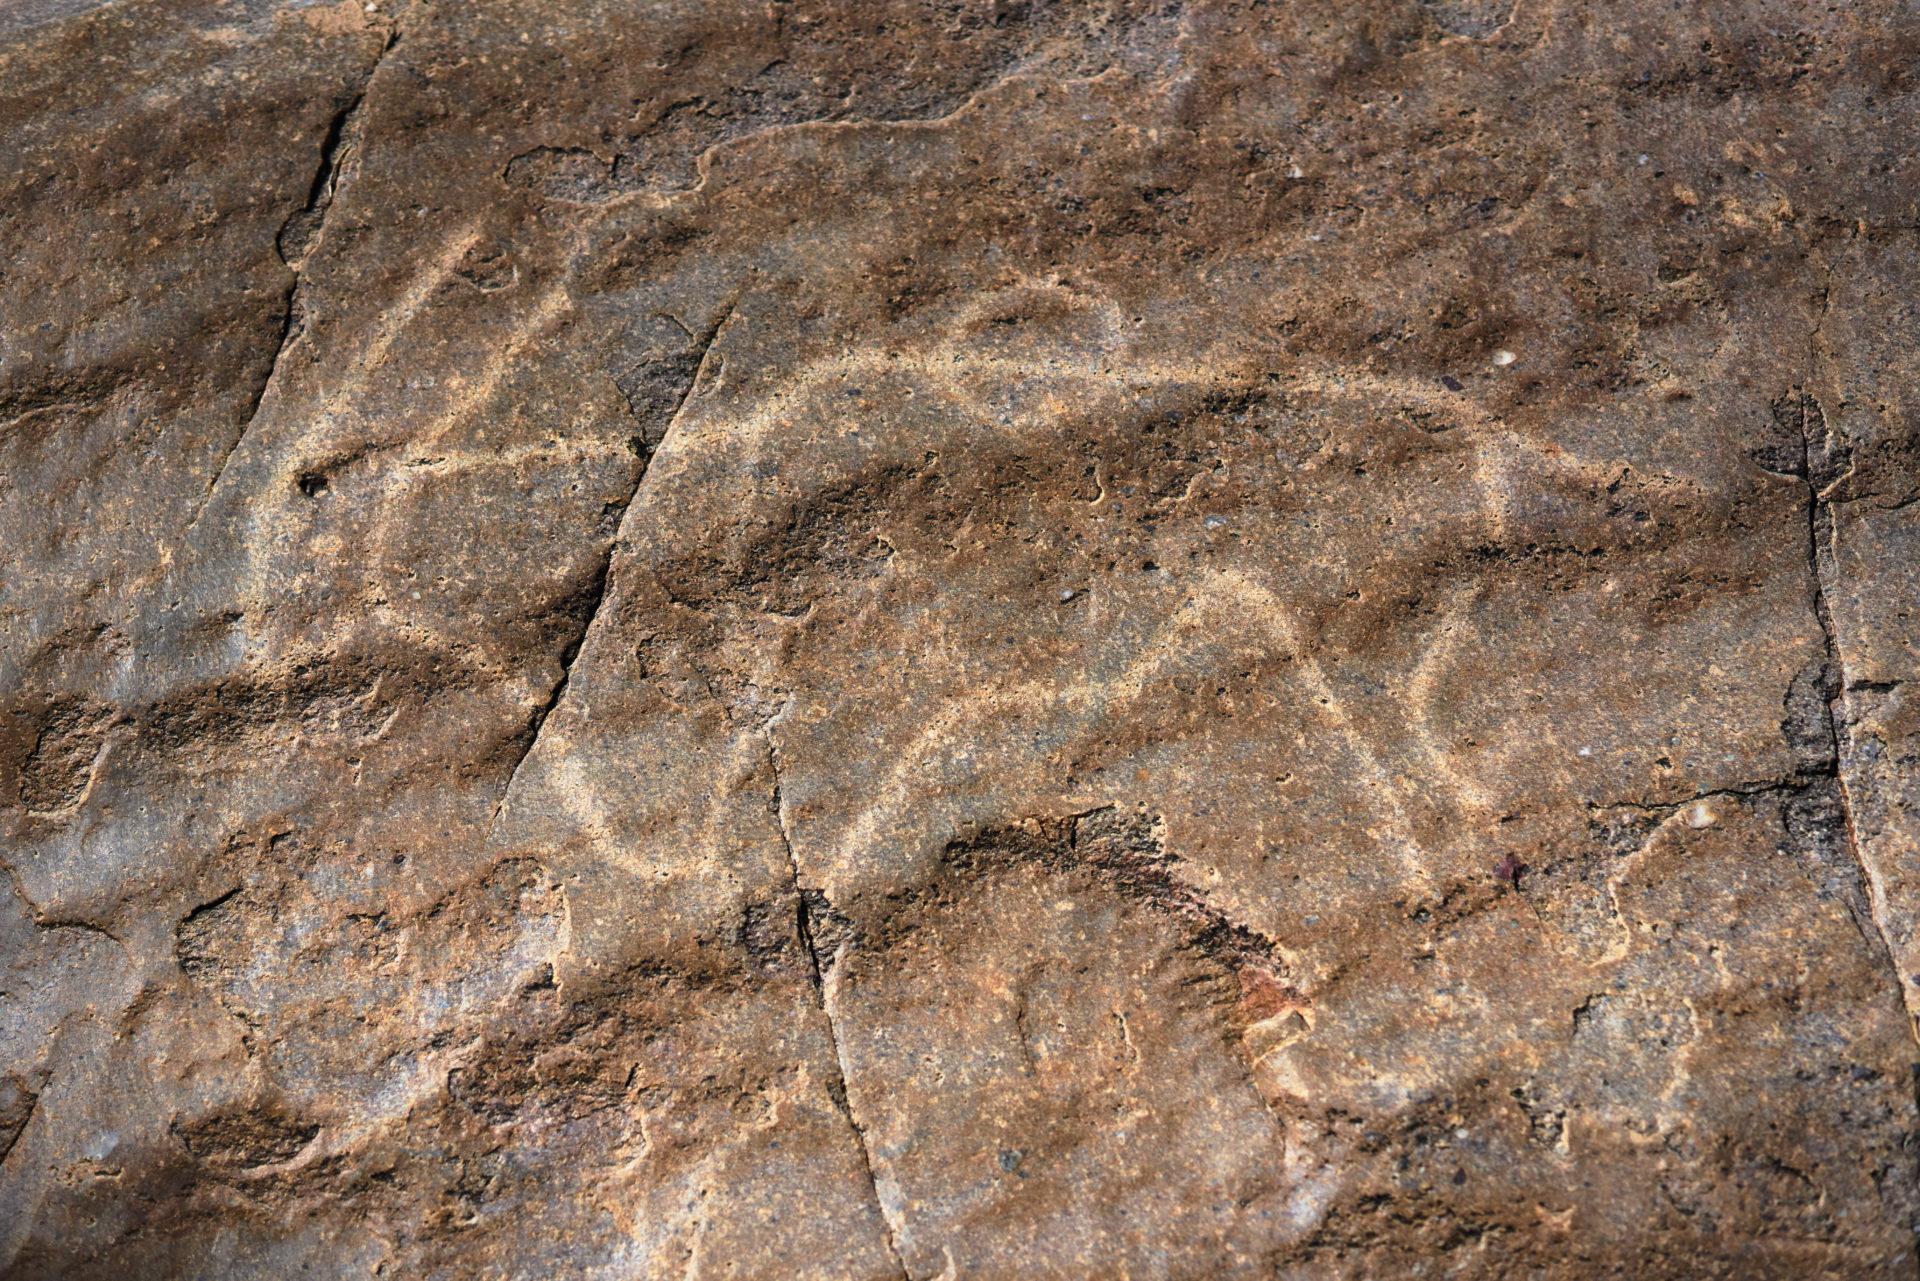 Tswalu Kalahari Conservation